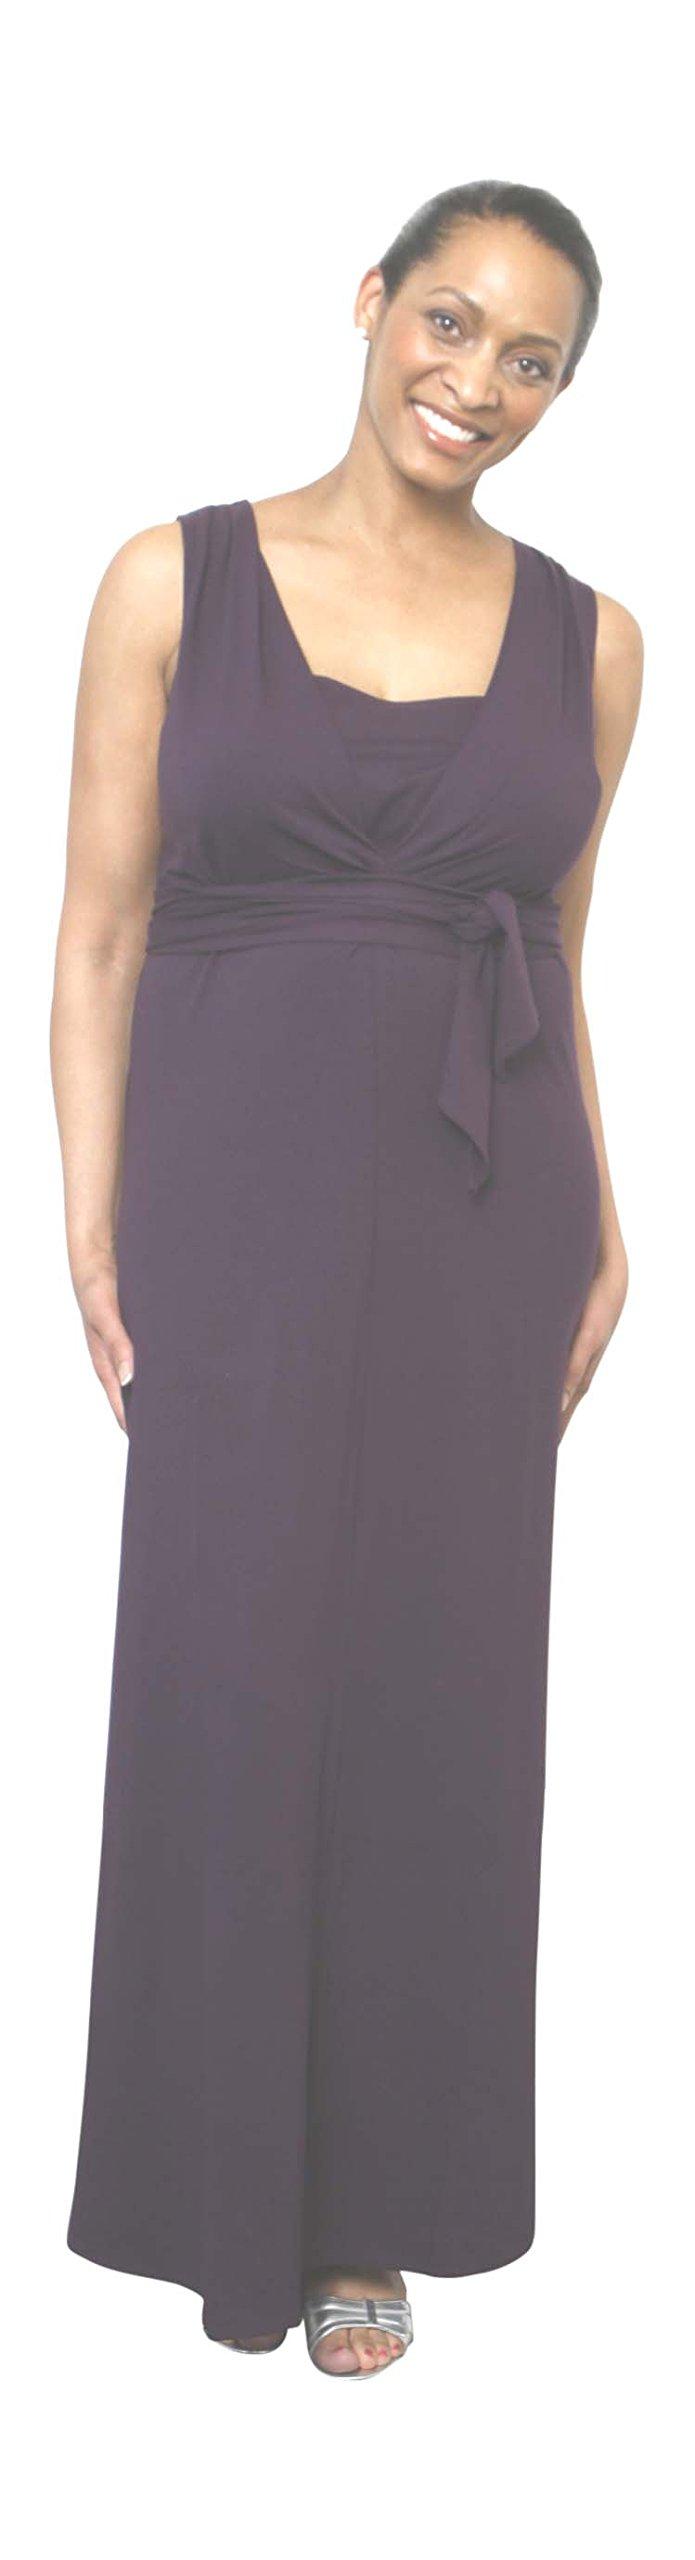 HadleyStilwell Jet Set Nursing Maxi Dress (Medium, Crocus)